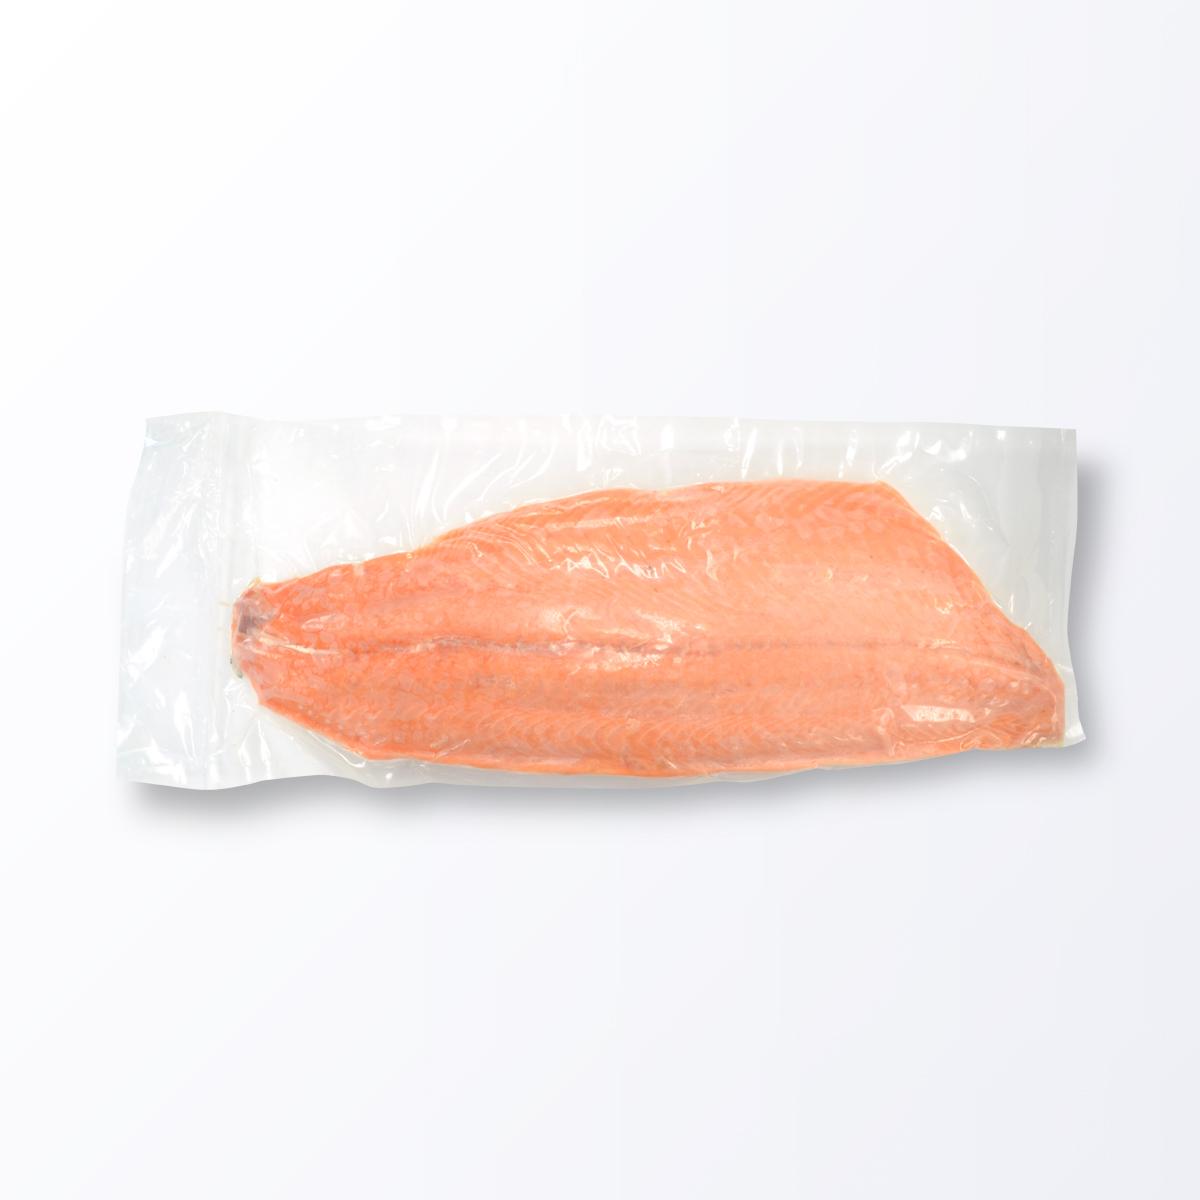 SAL362-Salmon-FIllet.jpg